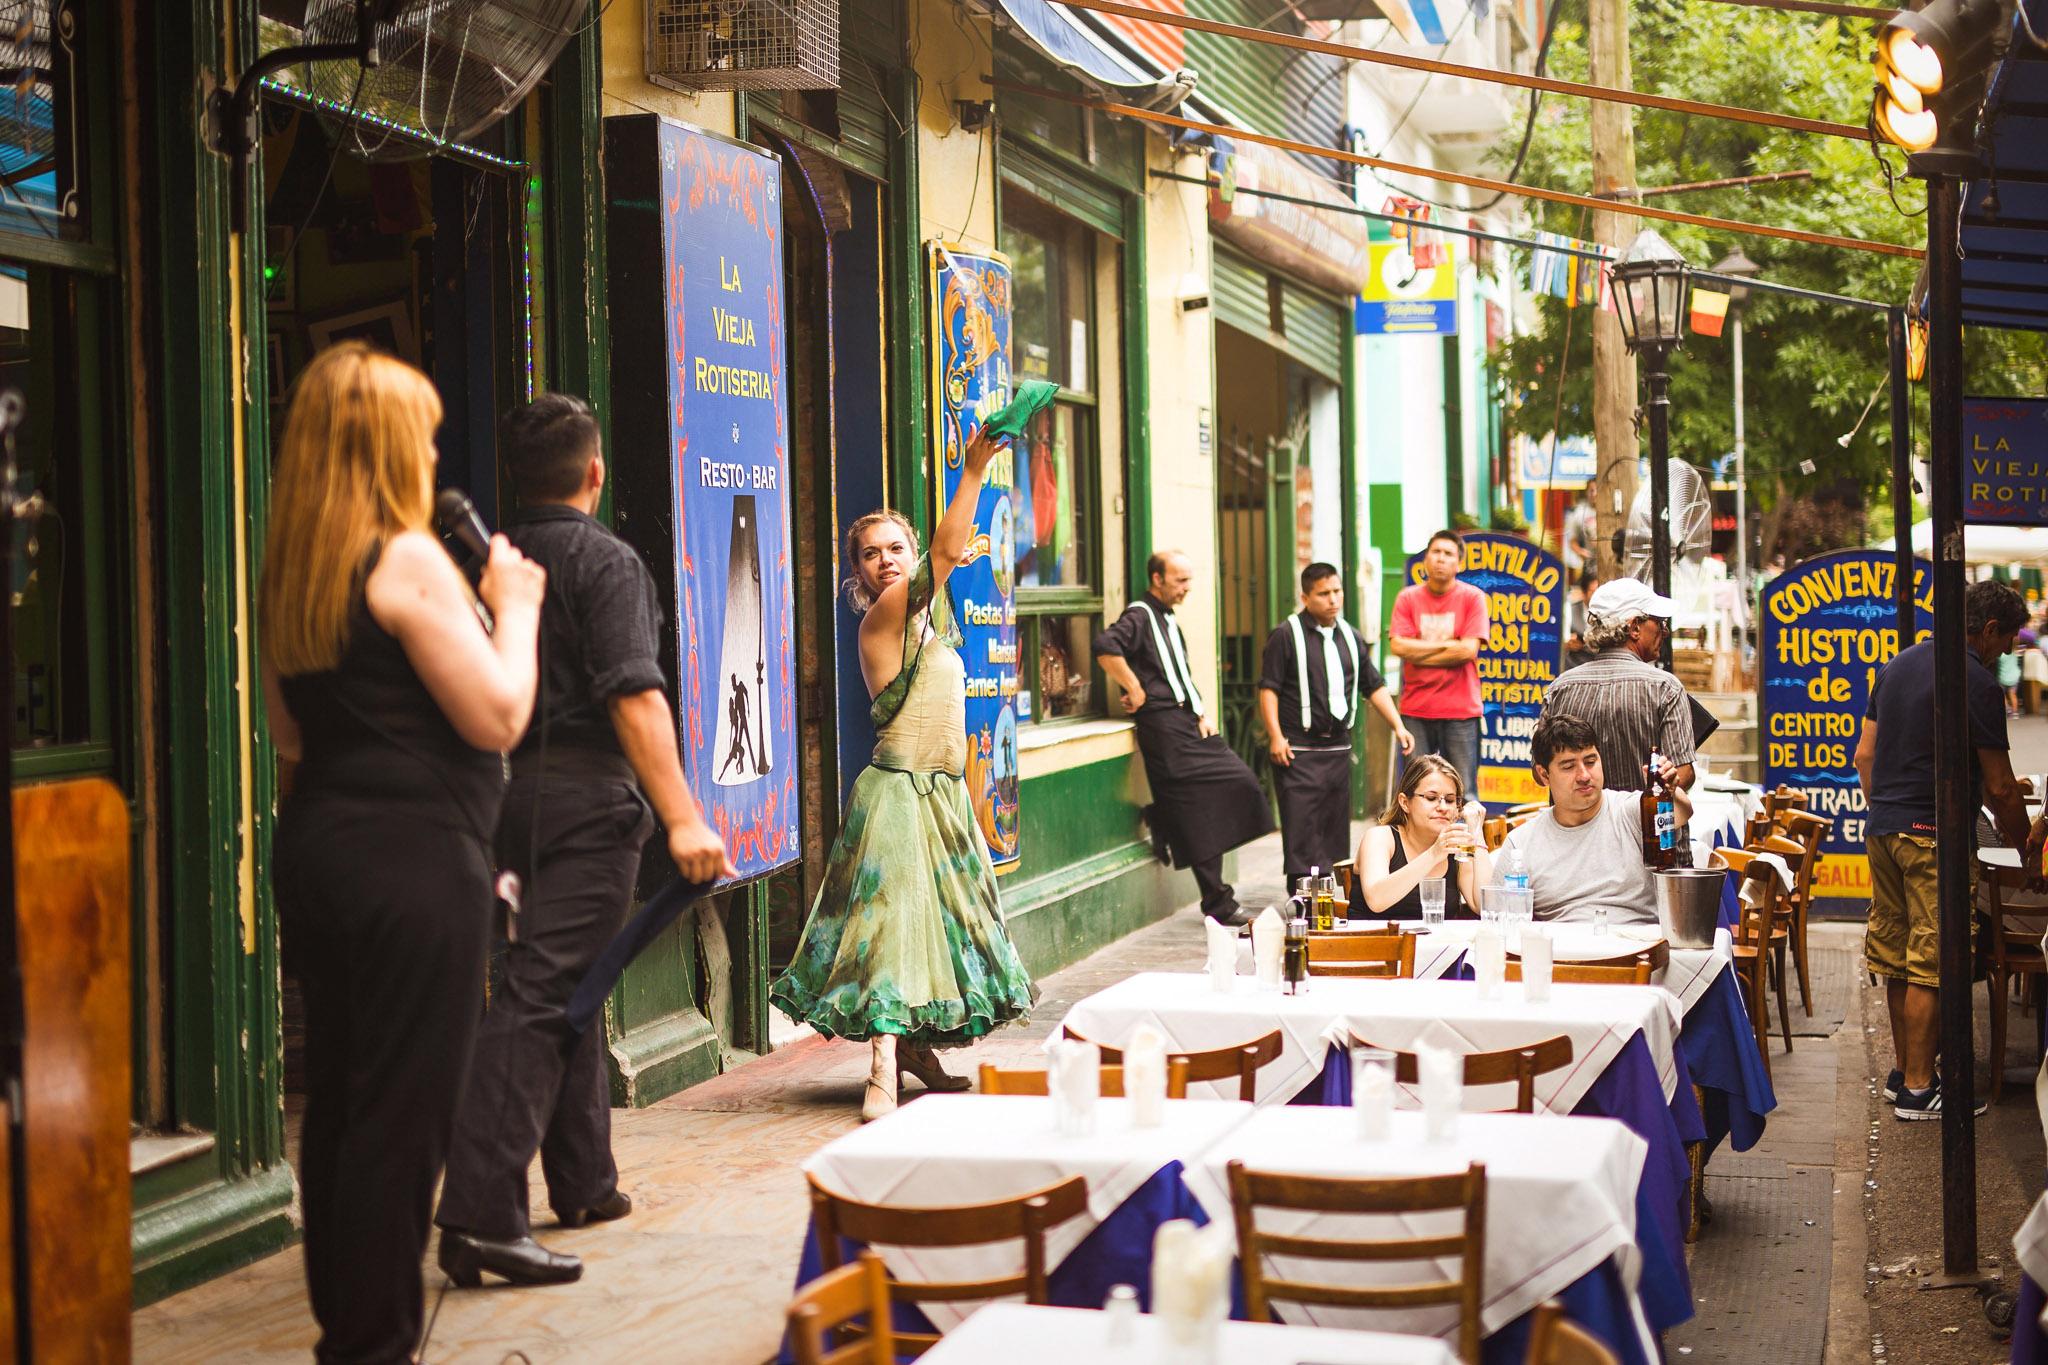 wedding-travellers-argentina-buenos-aires-la-boca-old-colorful-tango-dancer-vieja-rotiseria